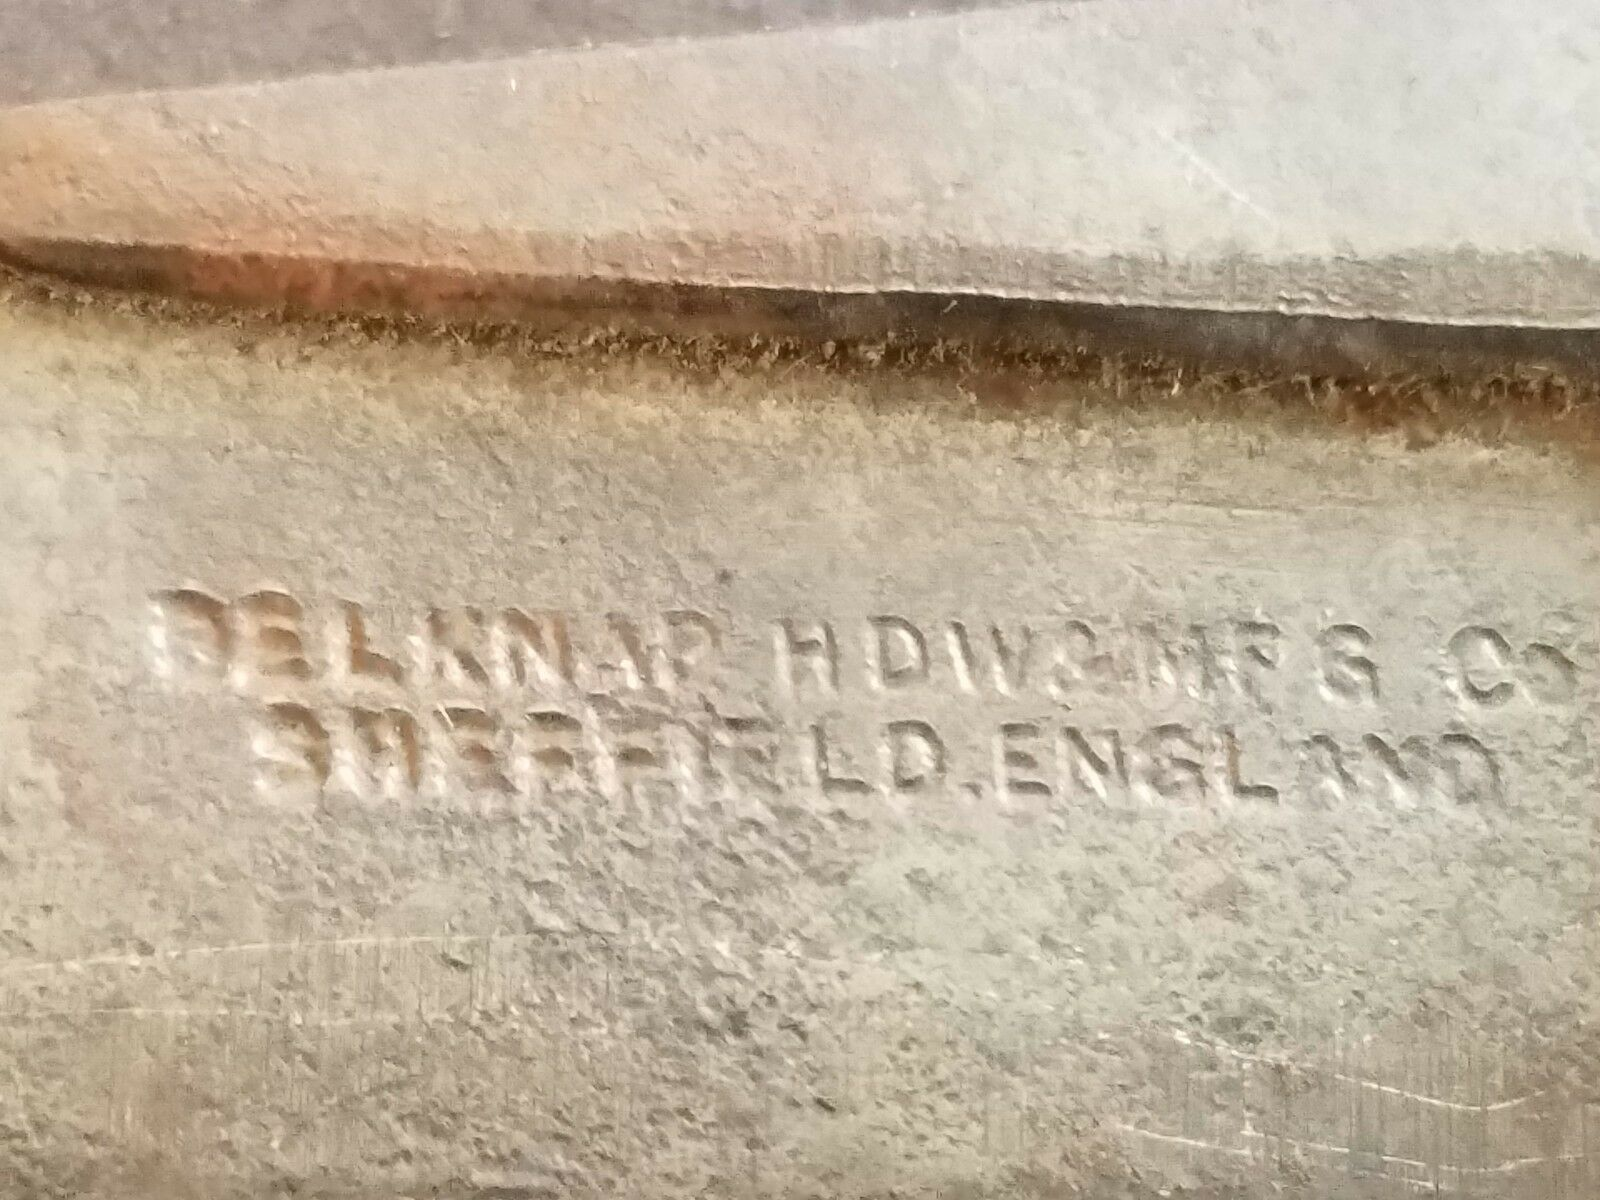 Antik Belknap Gras Schaf Schere Clipper Clipper Clipper Trimmer Werkzeug Made in Sheffield | Hochwertig  | Queensland  c0e9fb